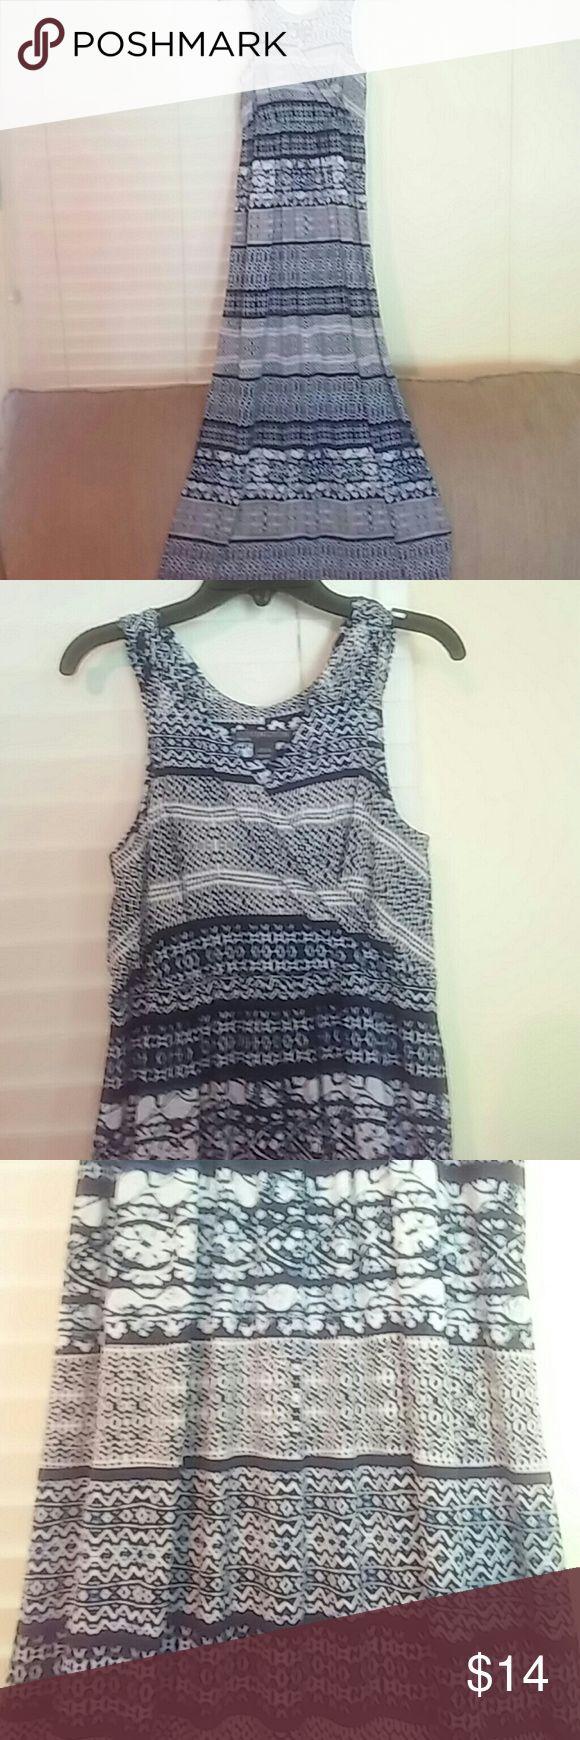 Covington Dress Petite Small Dark blue and white pattern stripped dress. Full length tank dress. Like new condition! Covington Dresses